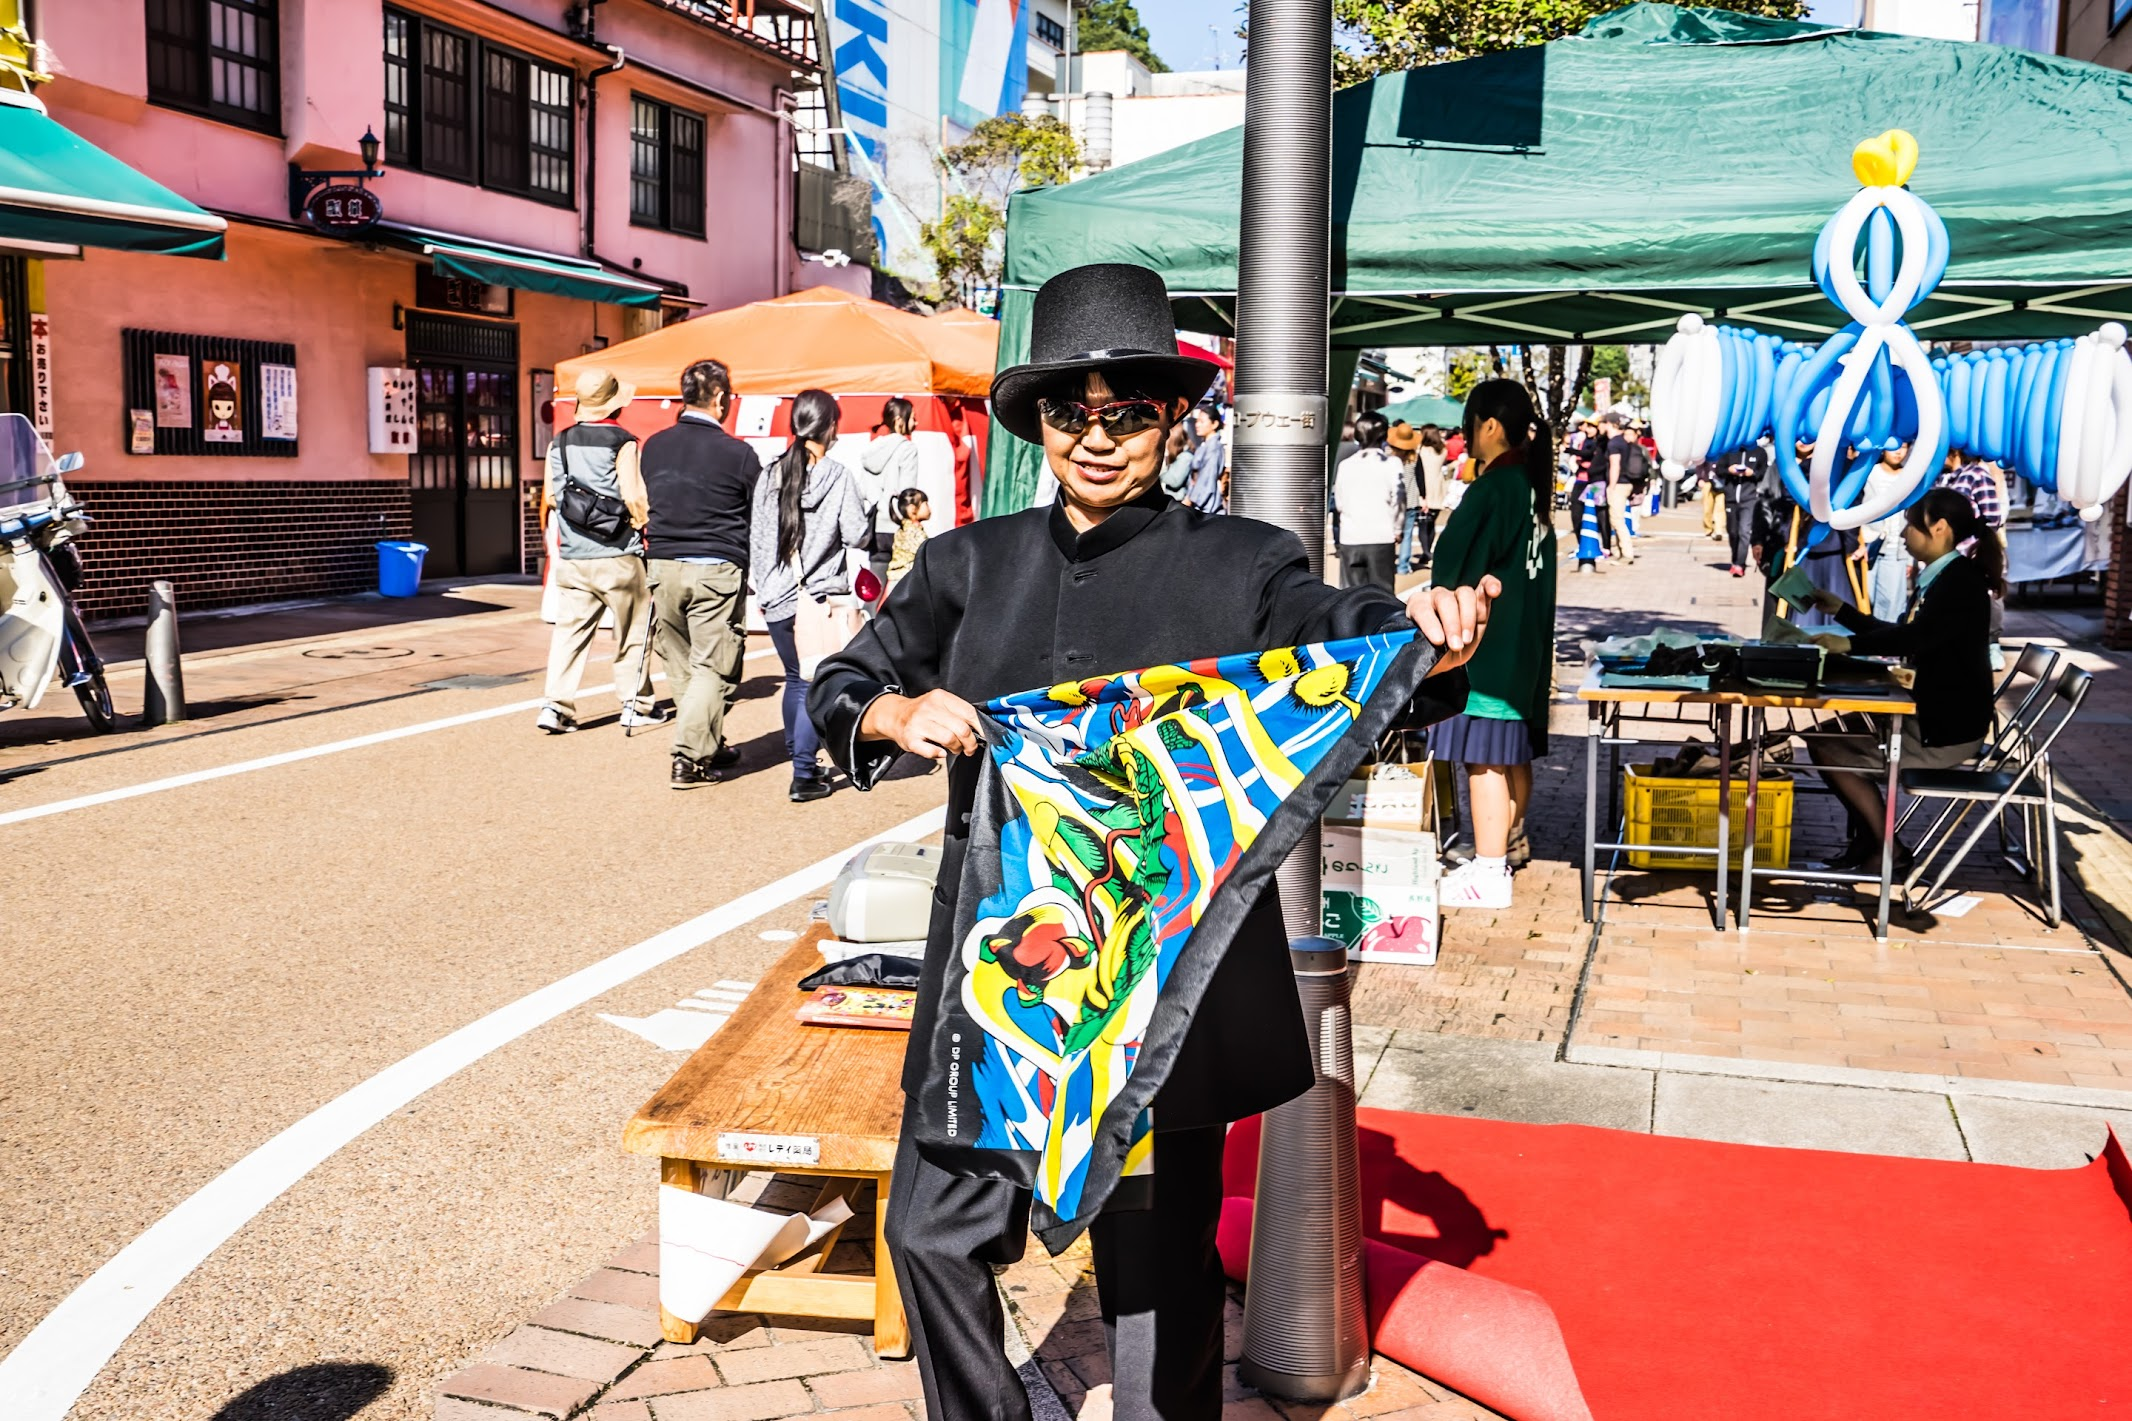 Shiroyama-monzen-matsuri Street performer1